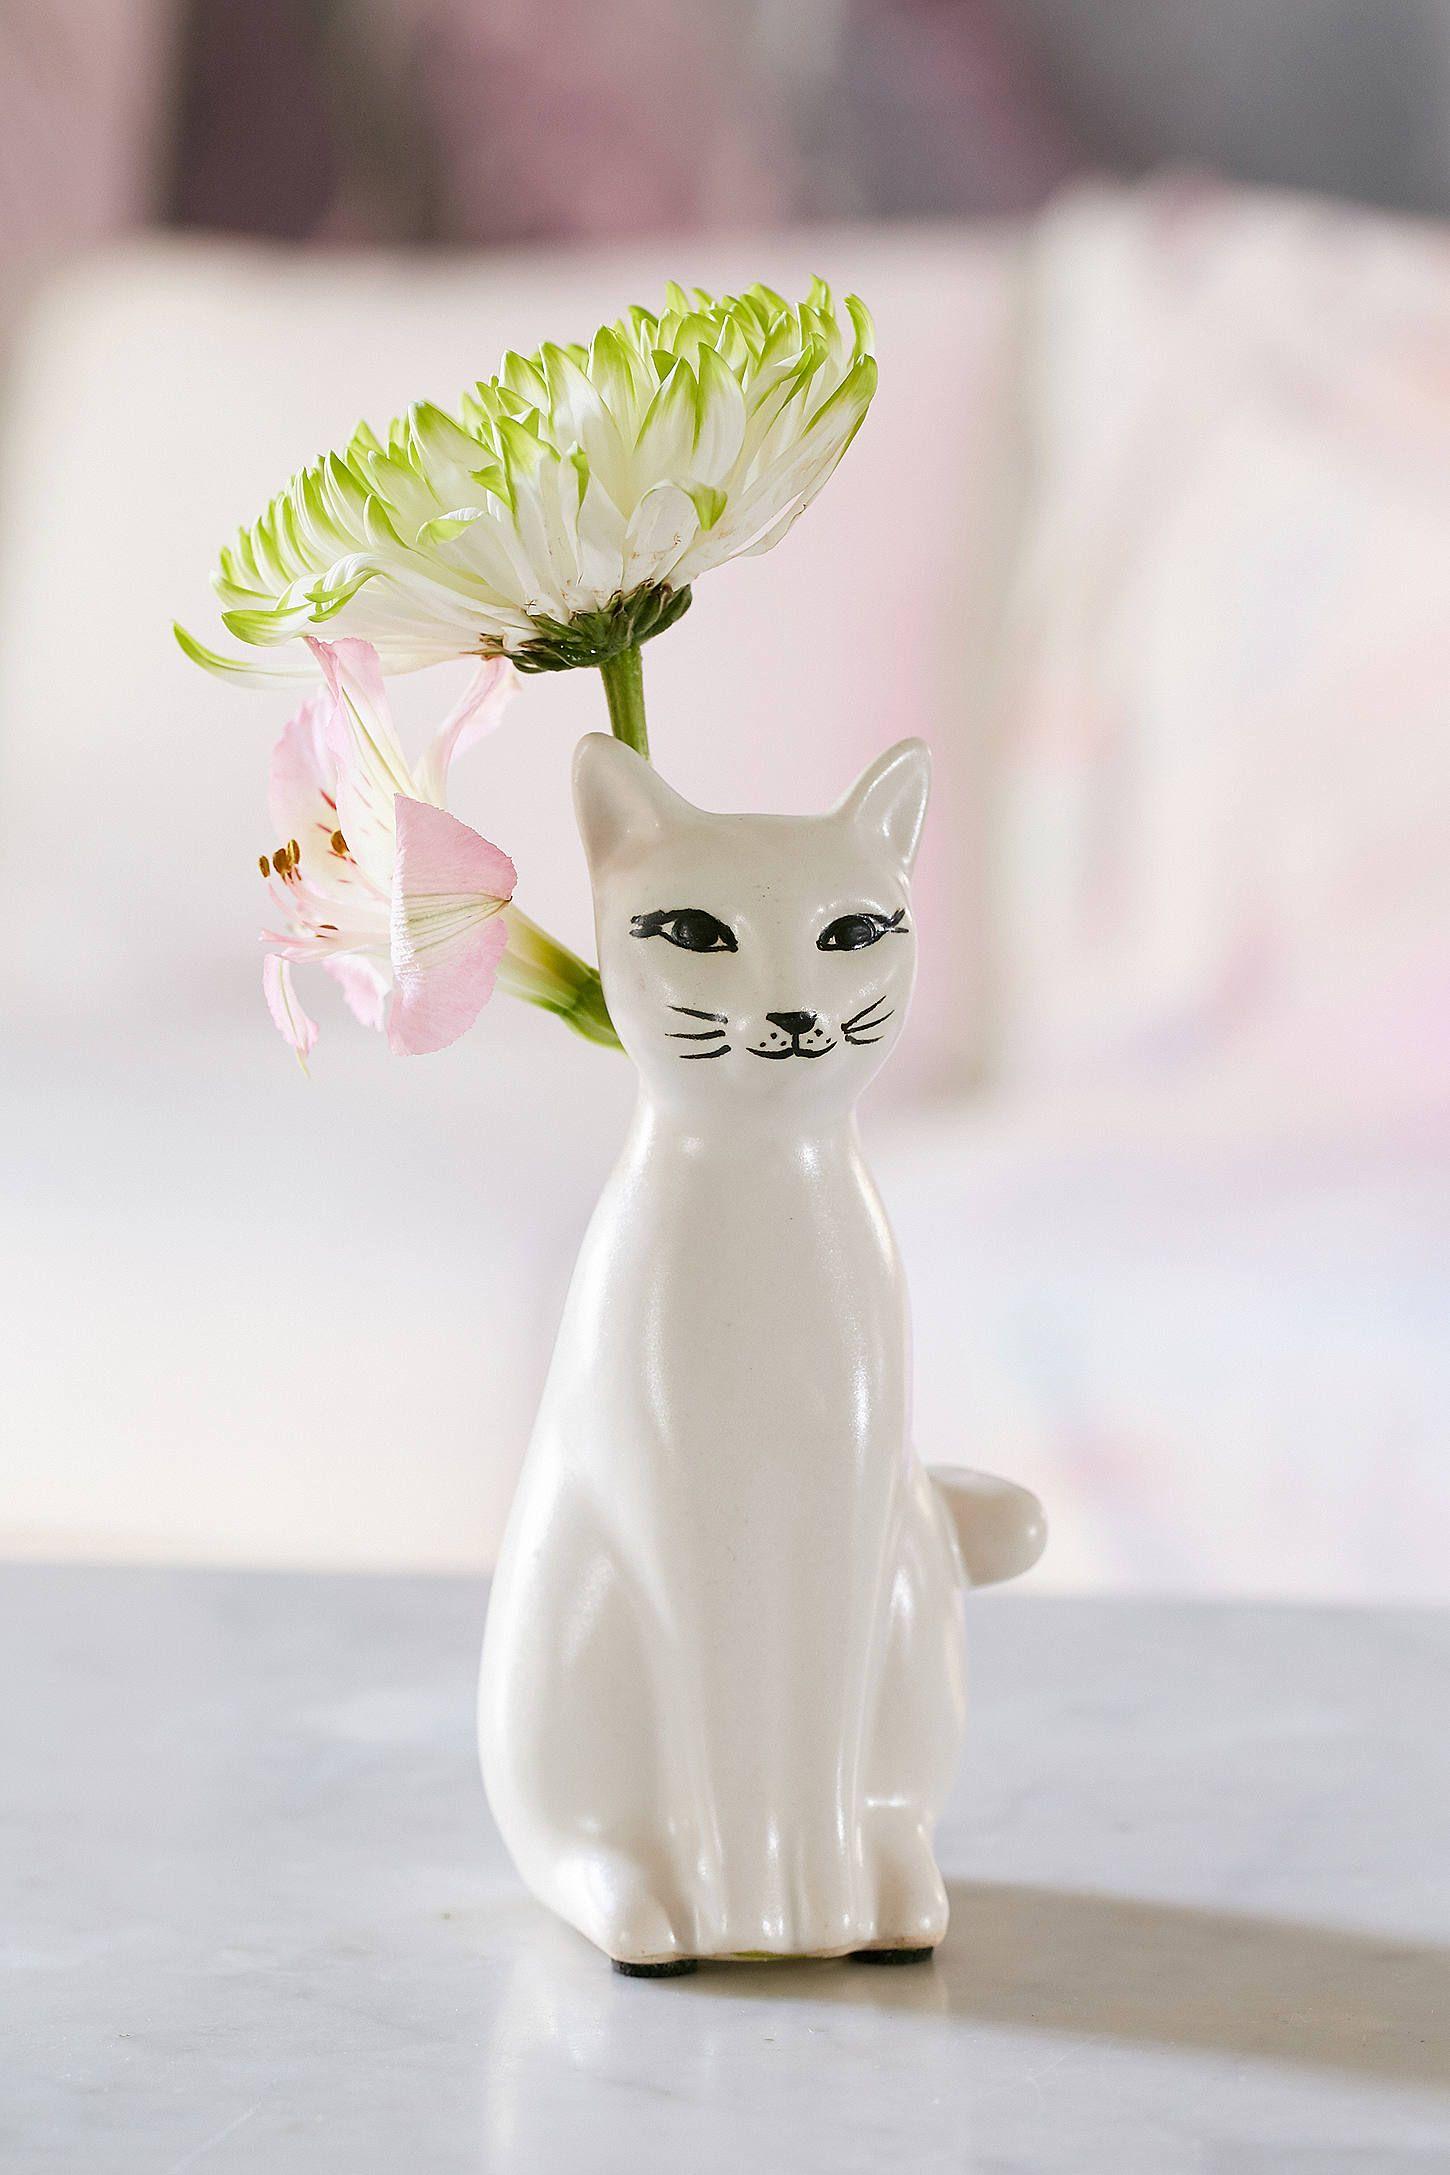 Slide View: 1: Vase im Kätzchendesign